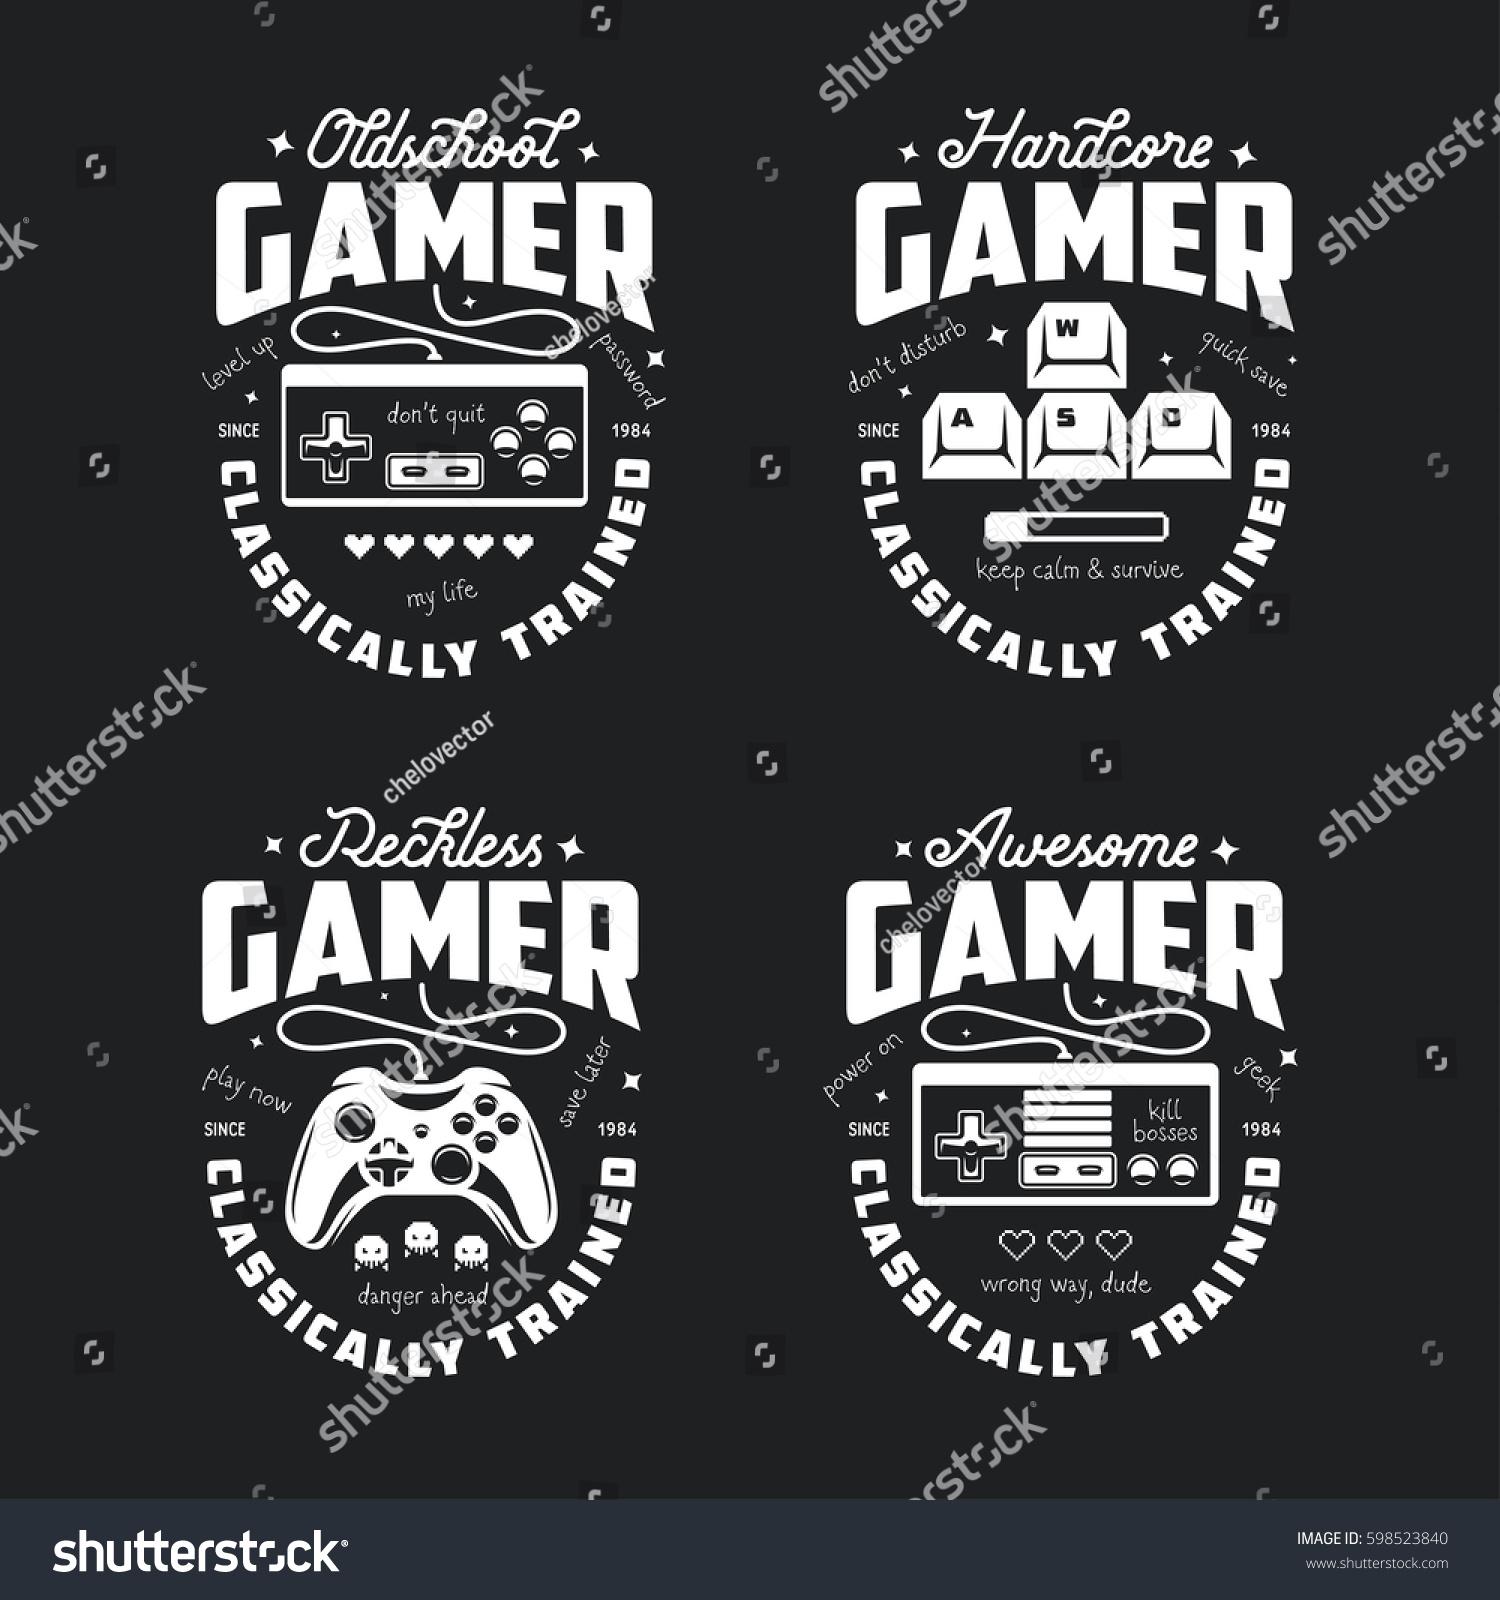 Shirt design video - Retro Video Games Related T Shirt Design Oldschool Gamer Text Monochrome Joystick Set